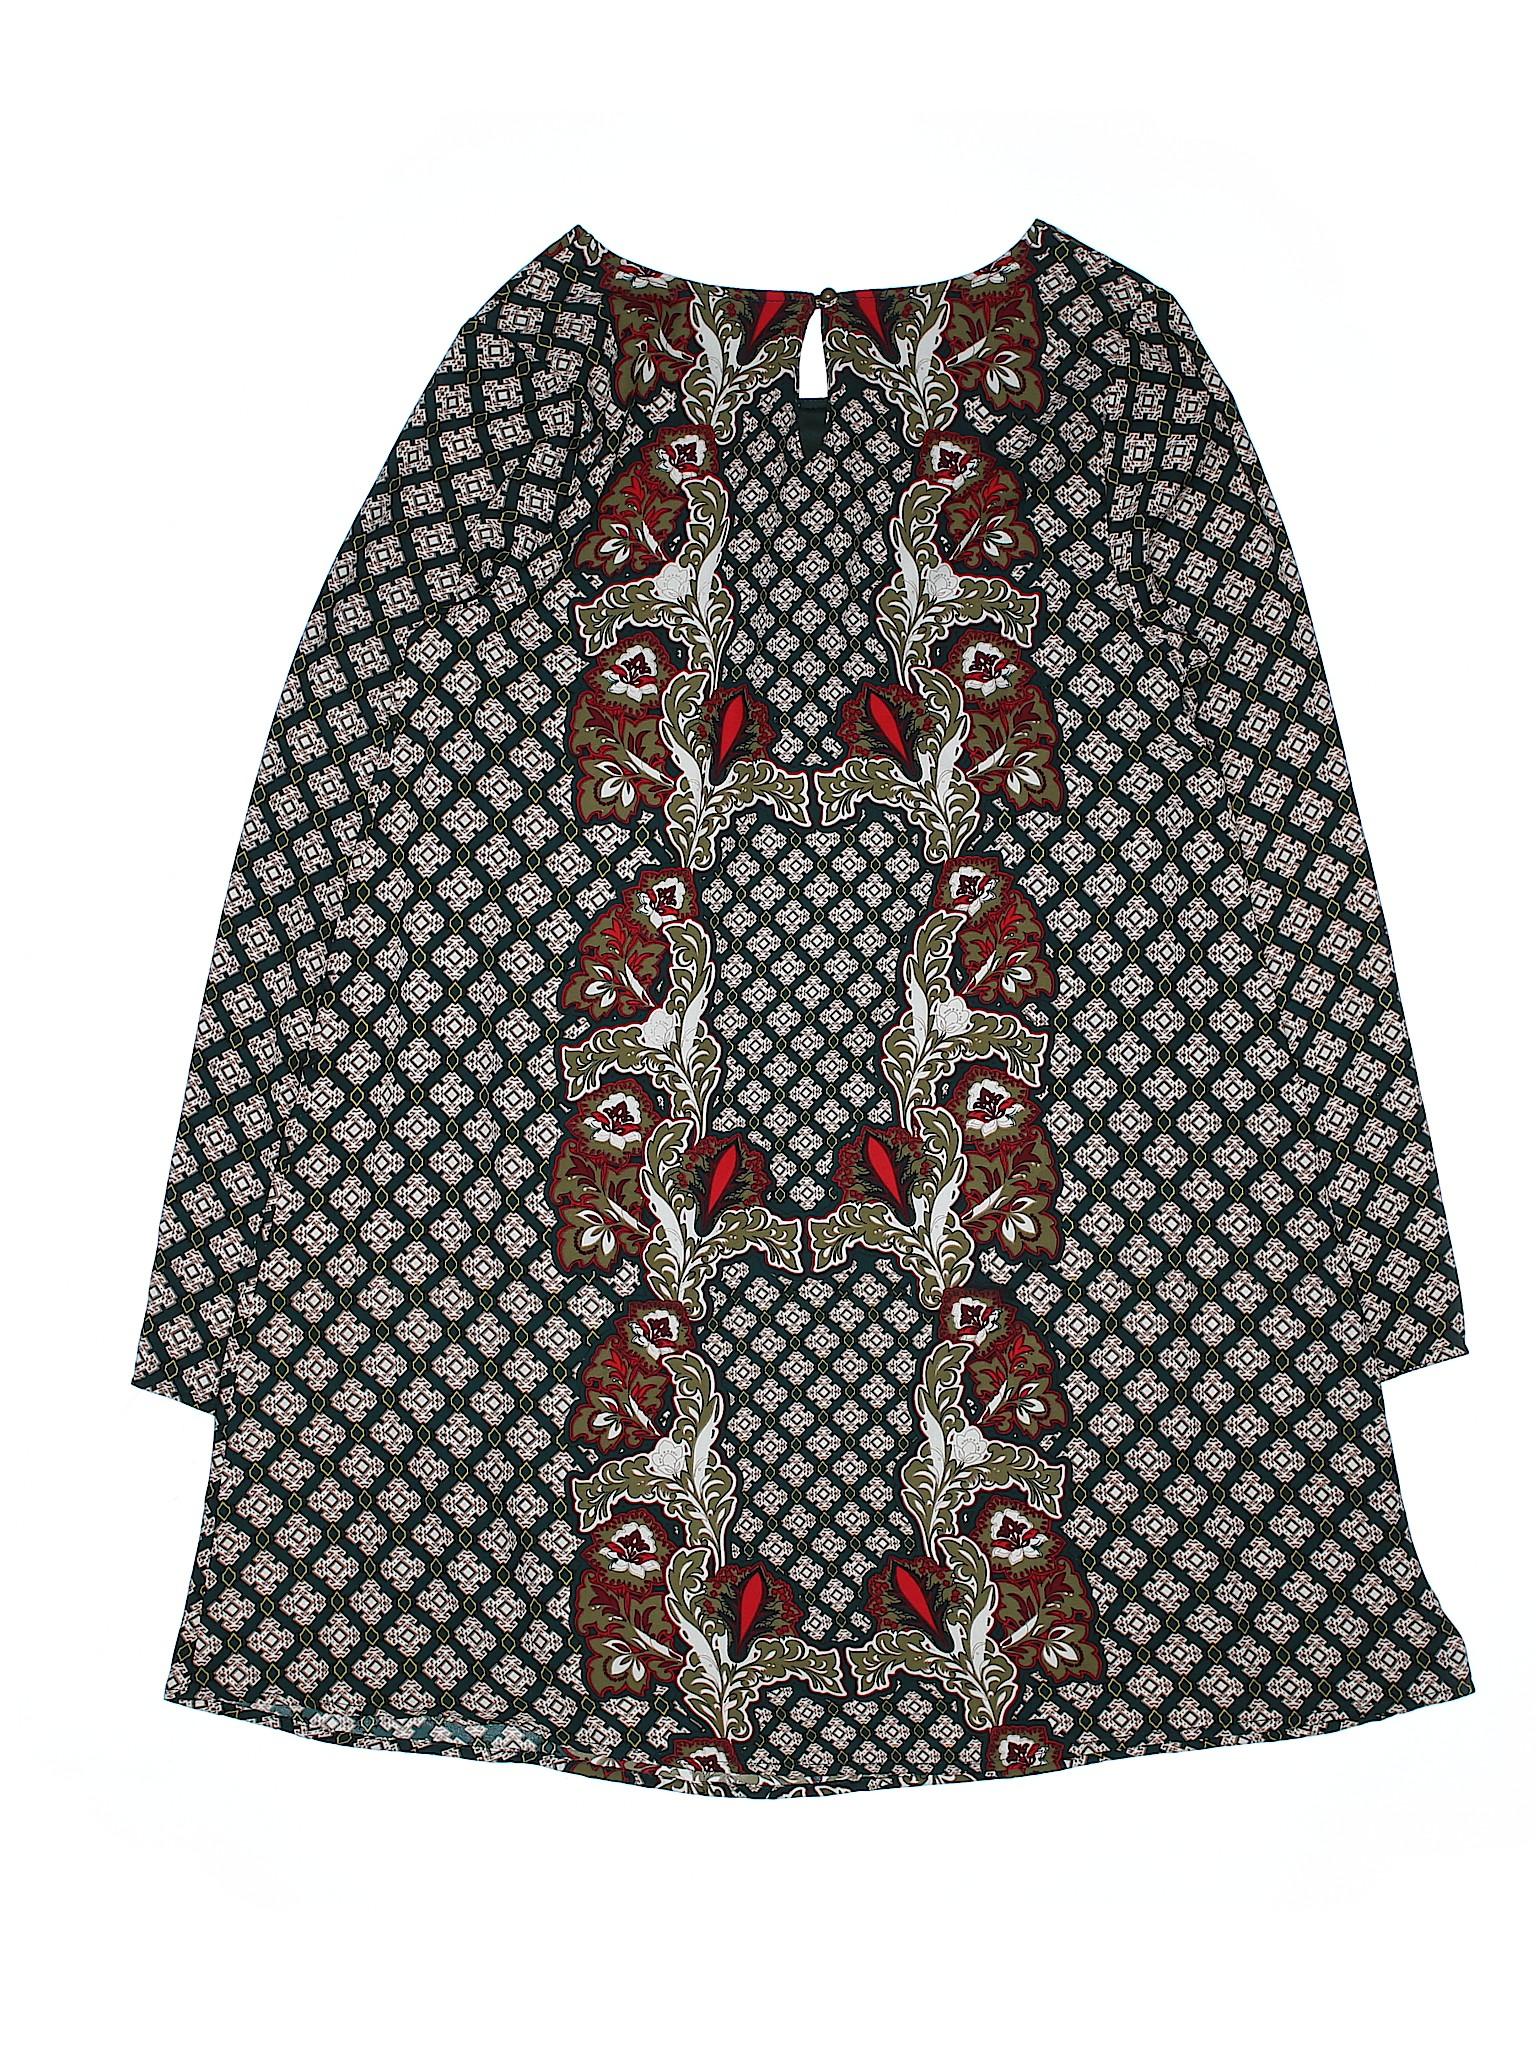 Boutique Casual Dress Boutique Xhilaration Casual winter winter Xhilaration rrPpBHR